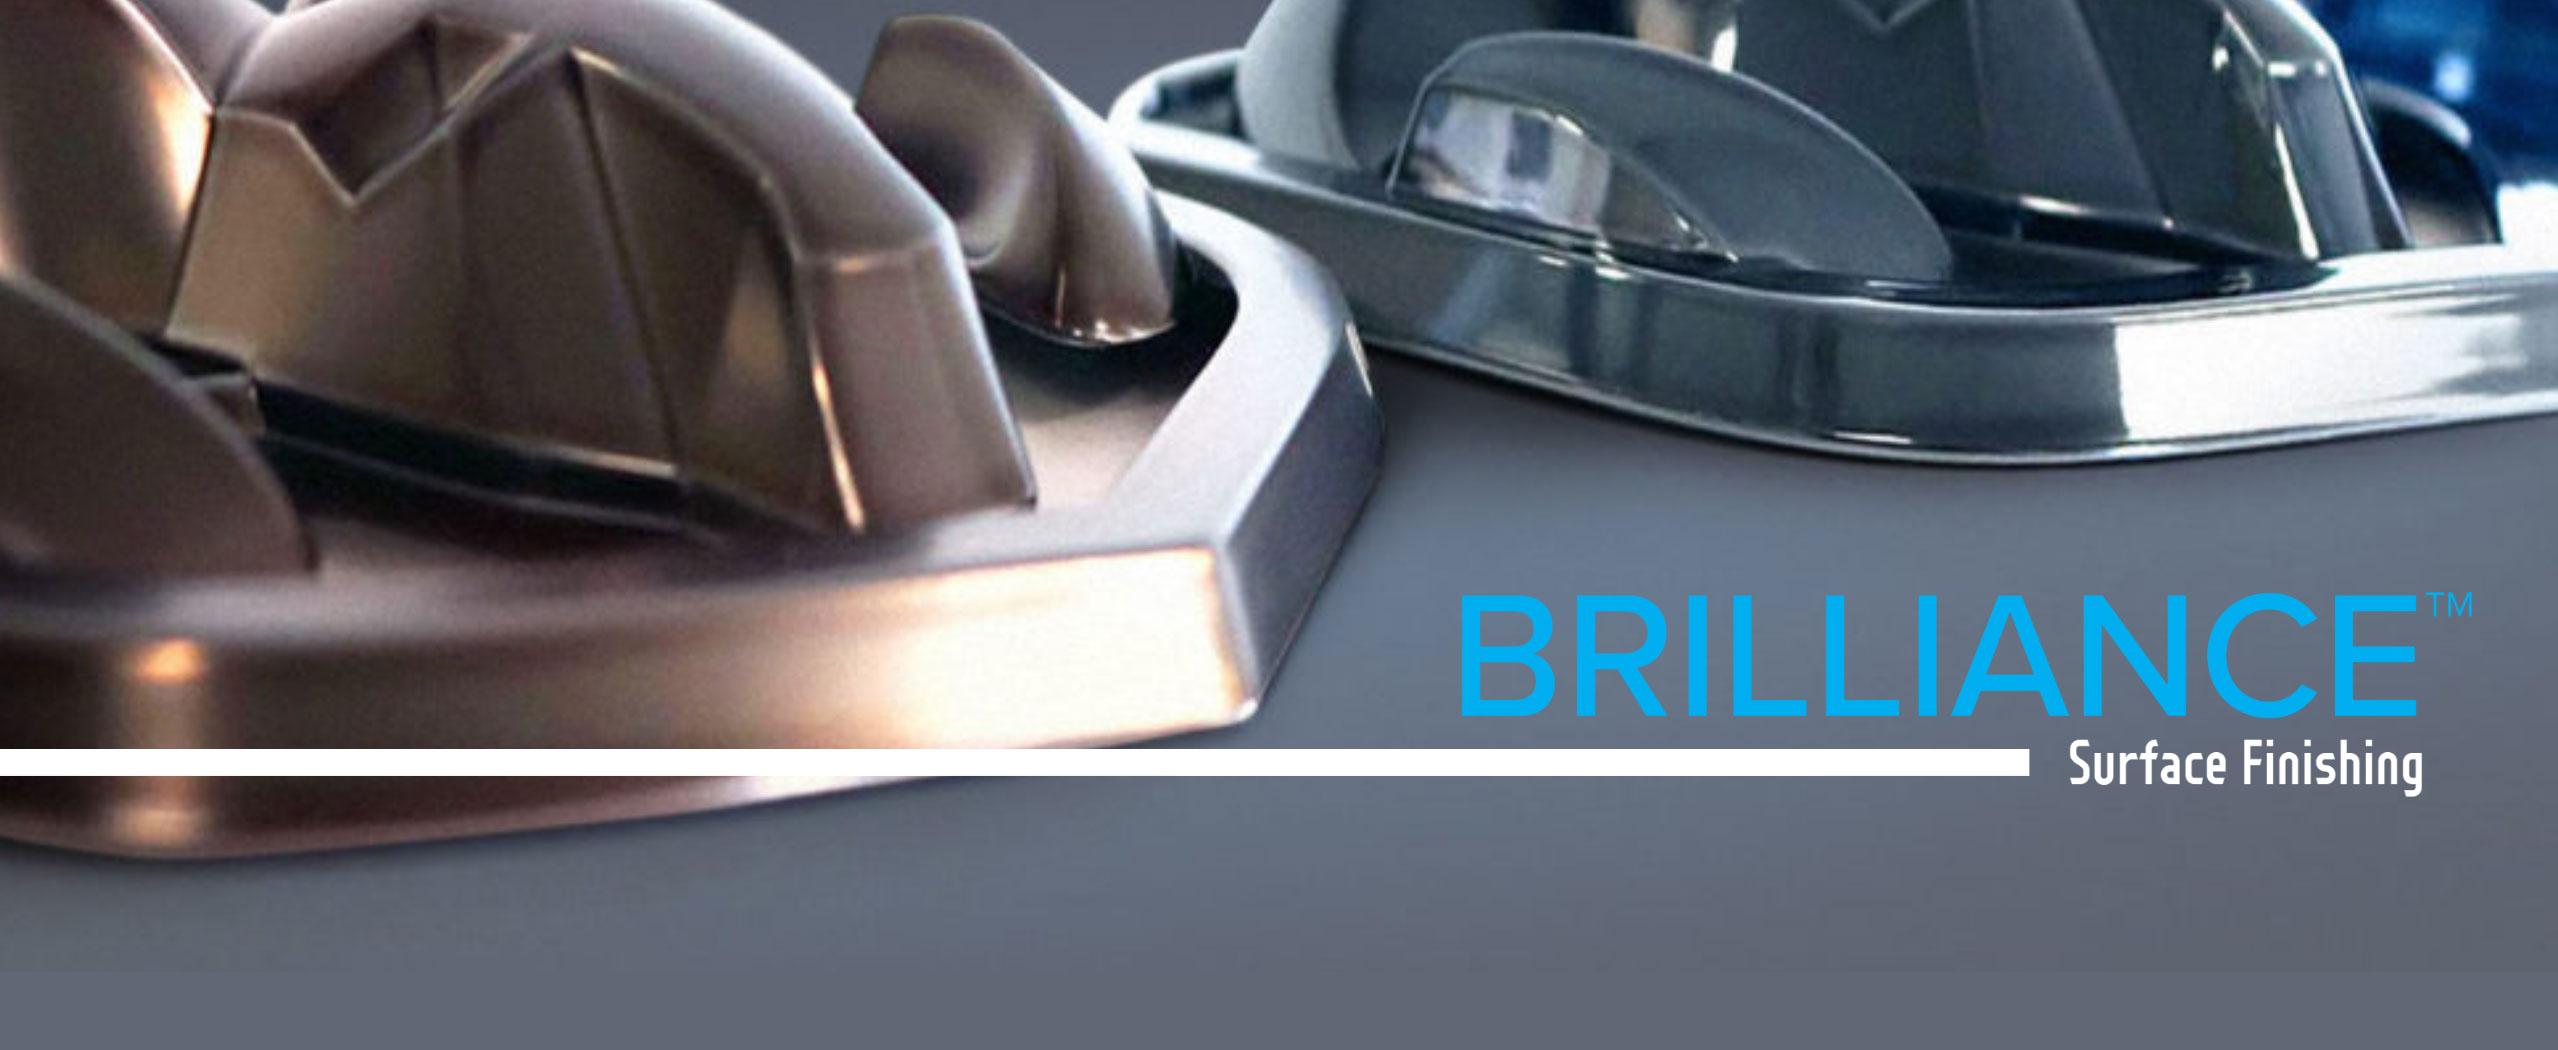 bg-brilliance